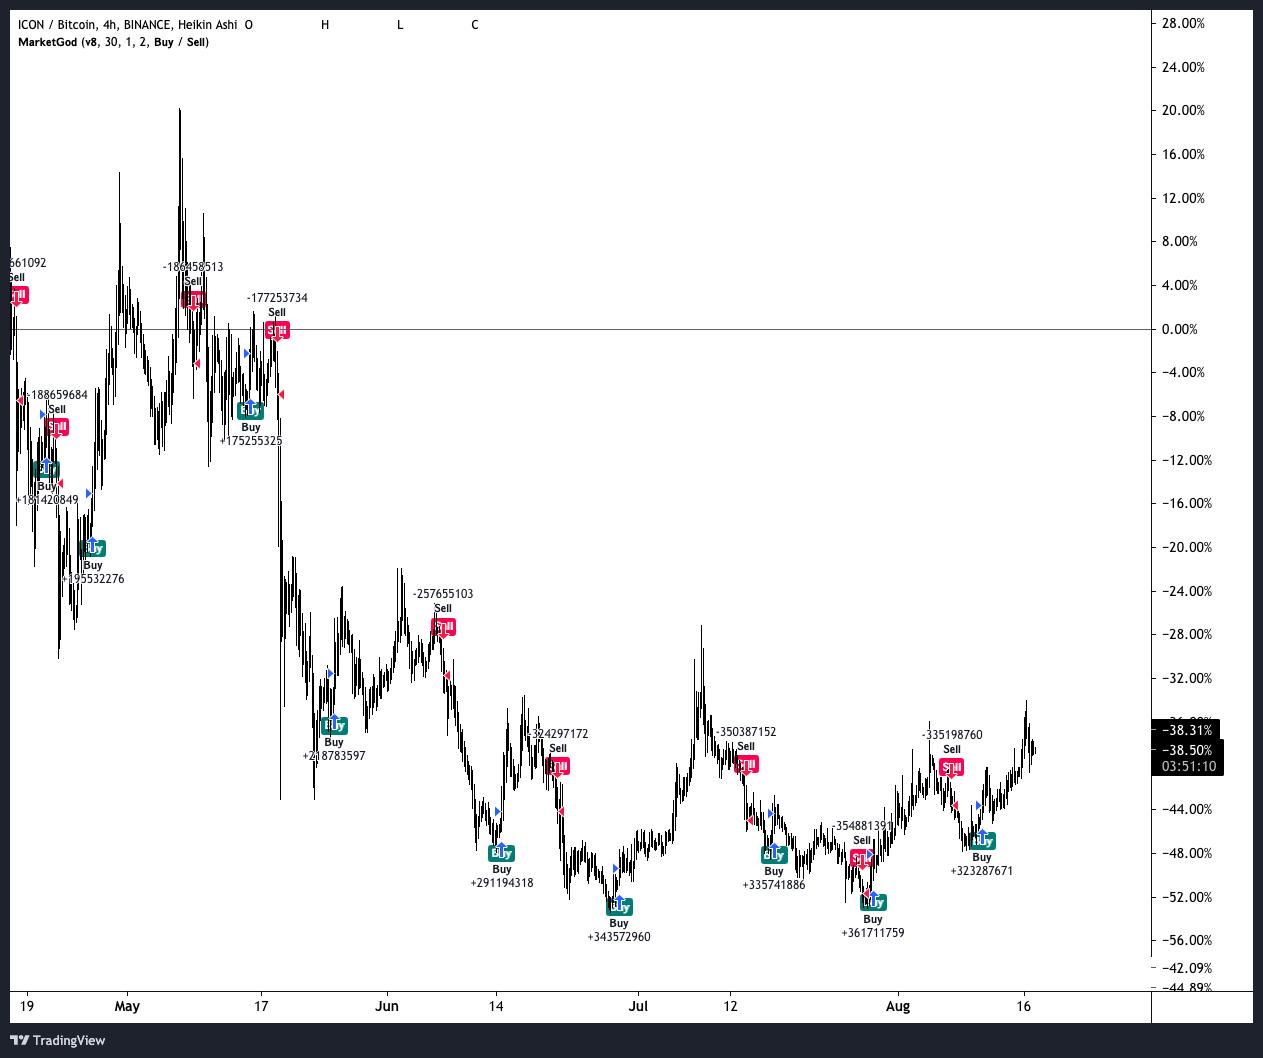 ICX vs BTC in 2021 using the MG Trading Tool Chart Overlay provided MarketGod Trading and MarketGod on Tradingview